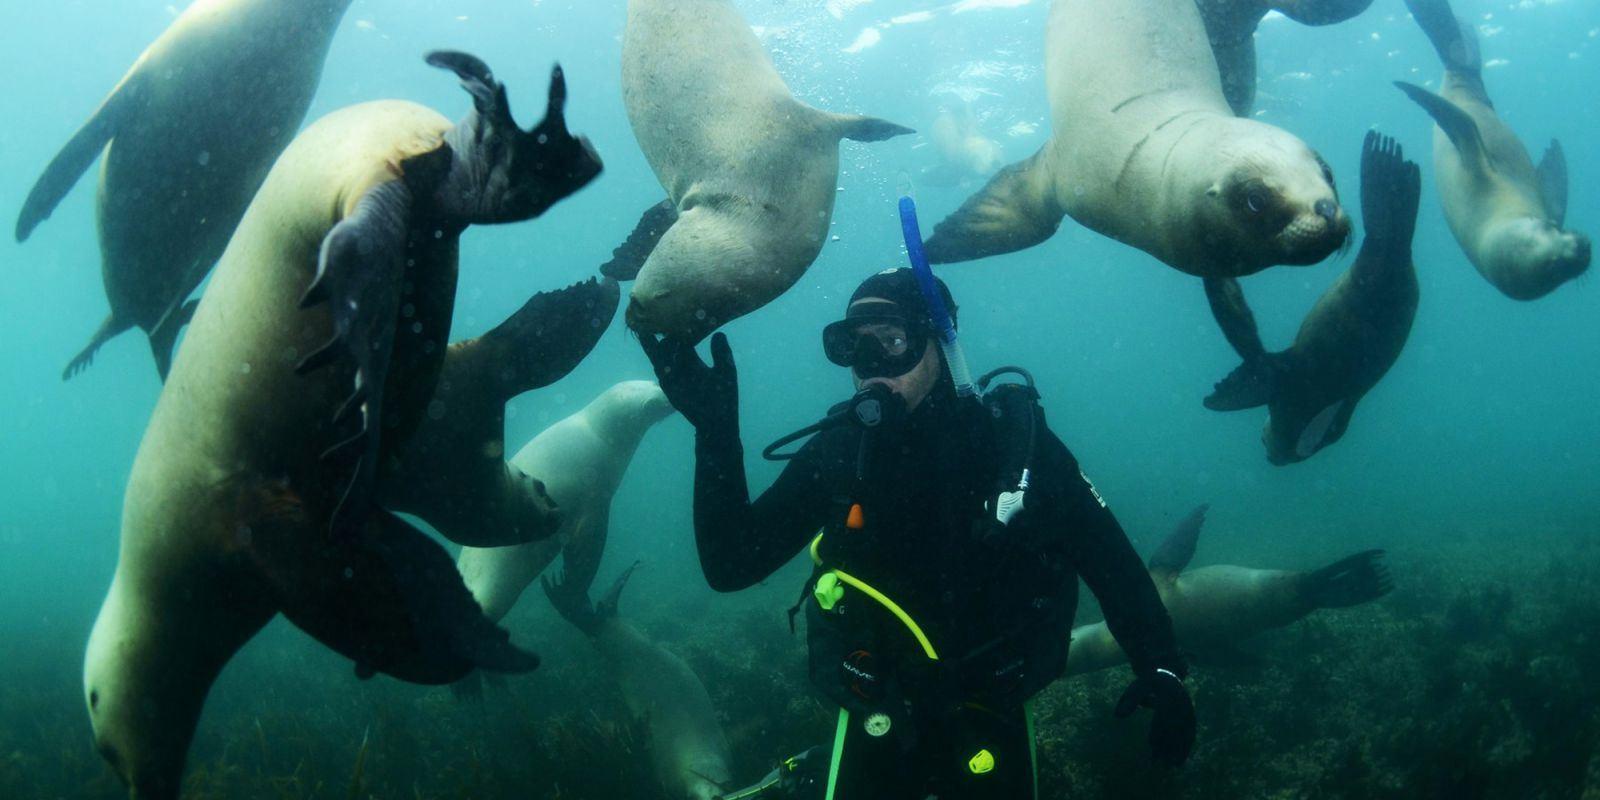 Nade com leões marinhos em Puerto Madryn